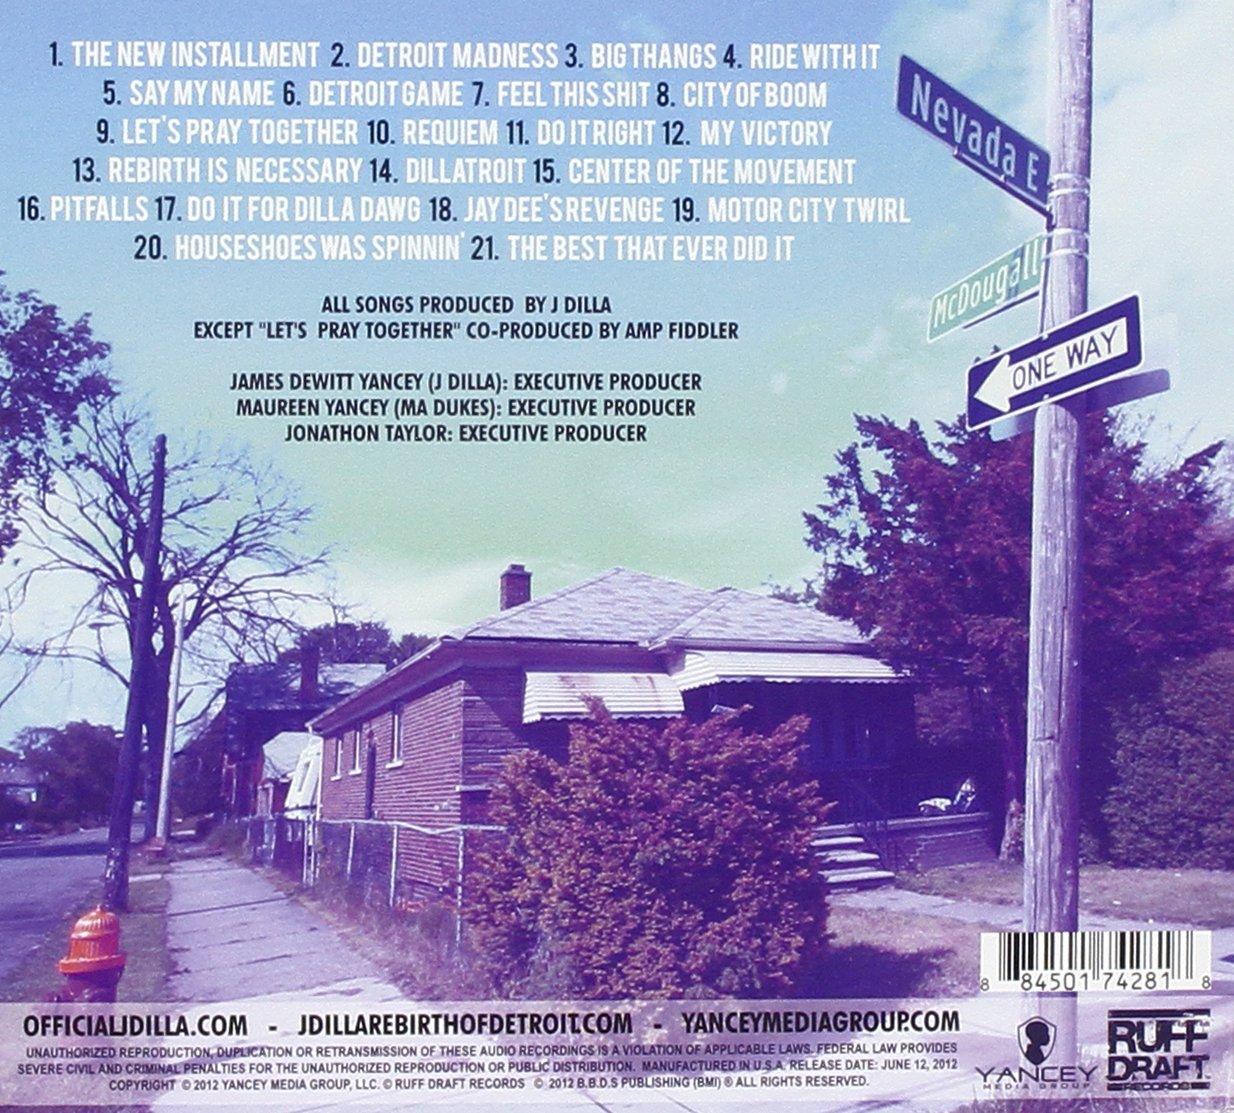 Amazon | Rebirth of Detroit | J Dilla | ヒップホップ一般 | 音楽